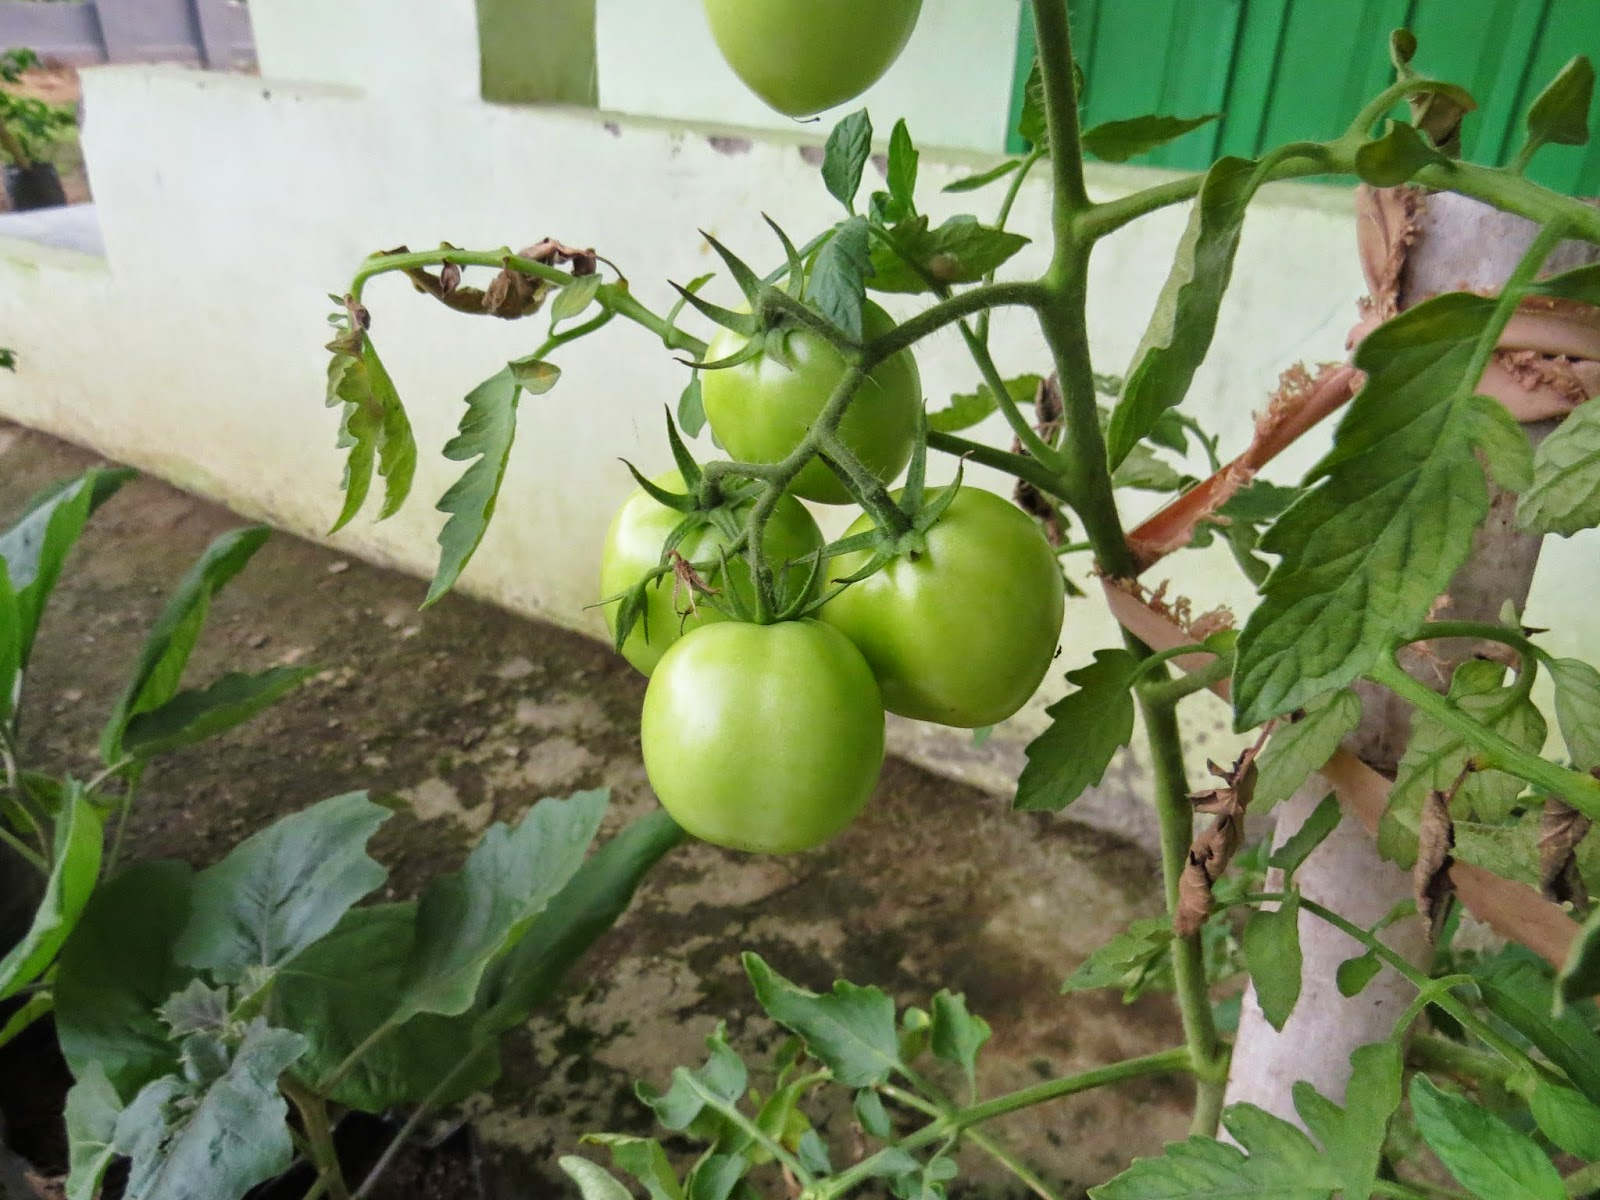 Buah Tomat Apel